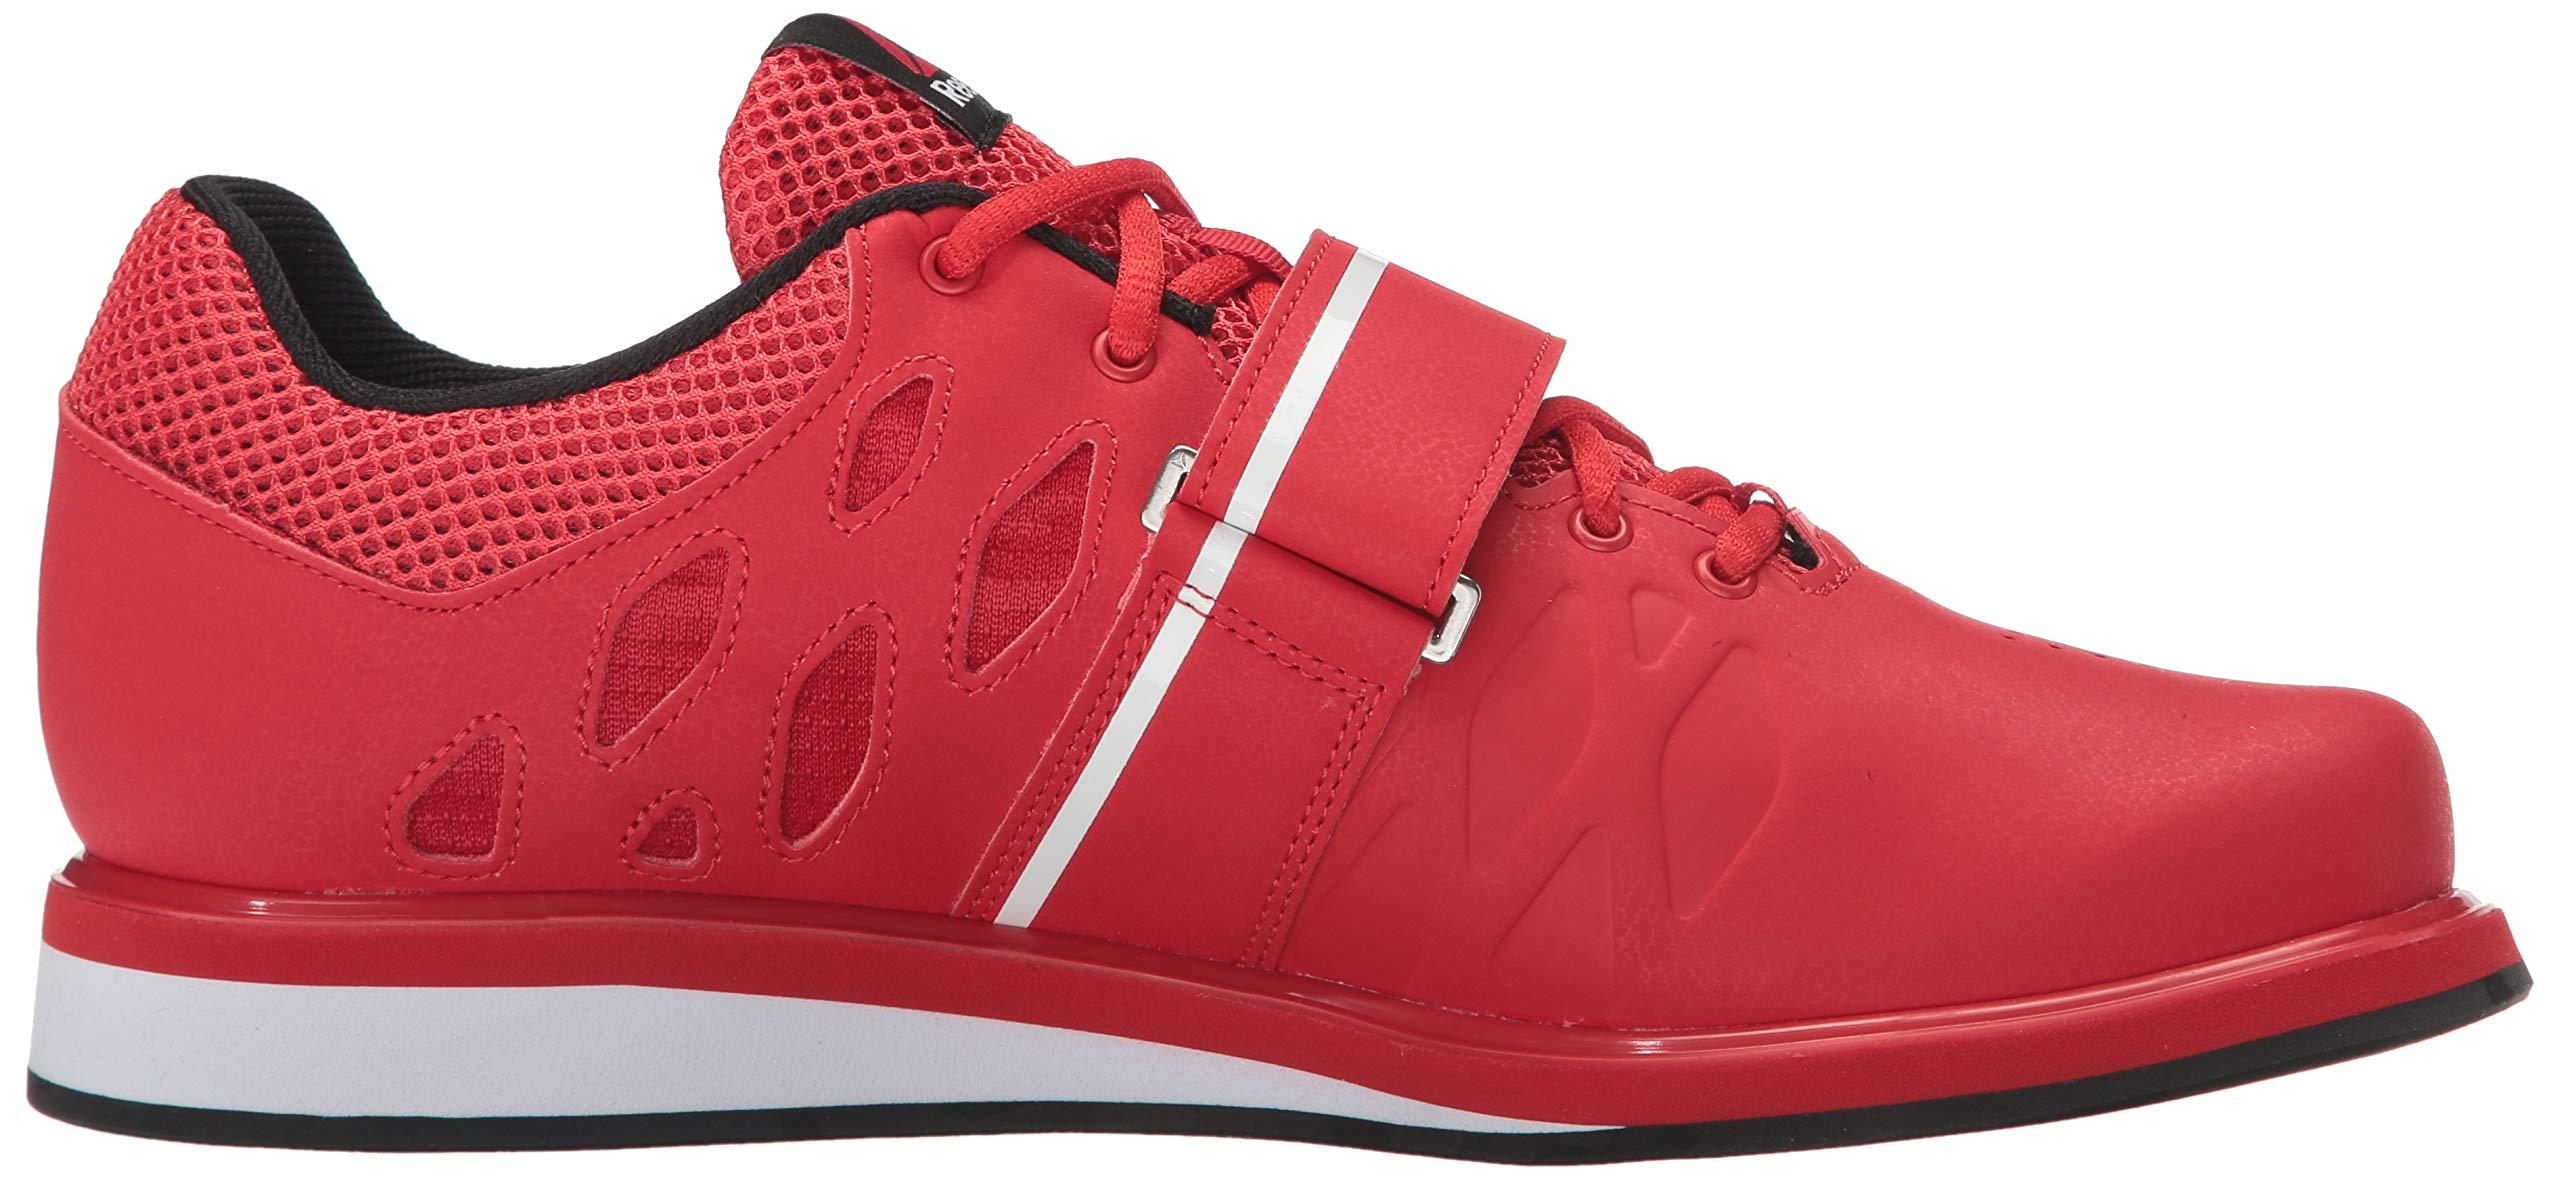 Reebok Men's Lifter Pr Cross-Trainer Shoe, Primal Red/Black/White, 7.5 M US by Reebok (Image #12)